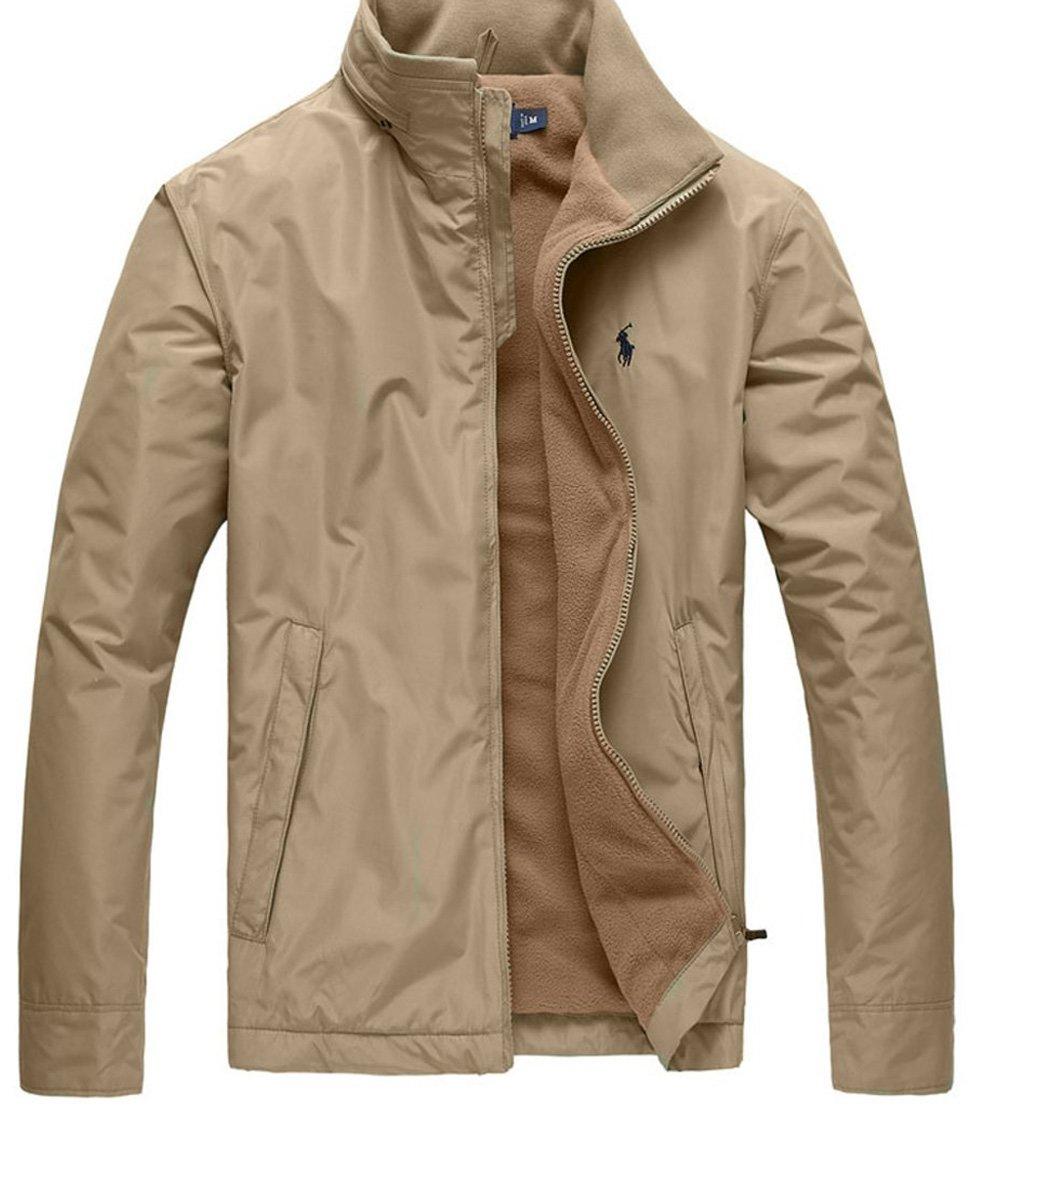 Куртка POLO Ralph Lauren KR1 (Бежевый)